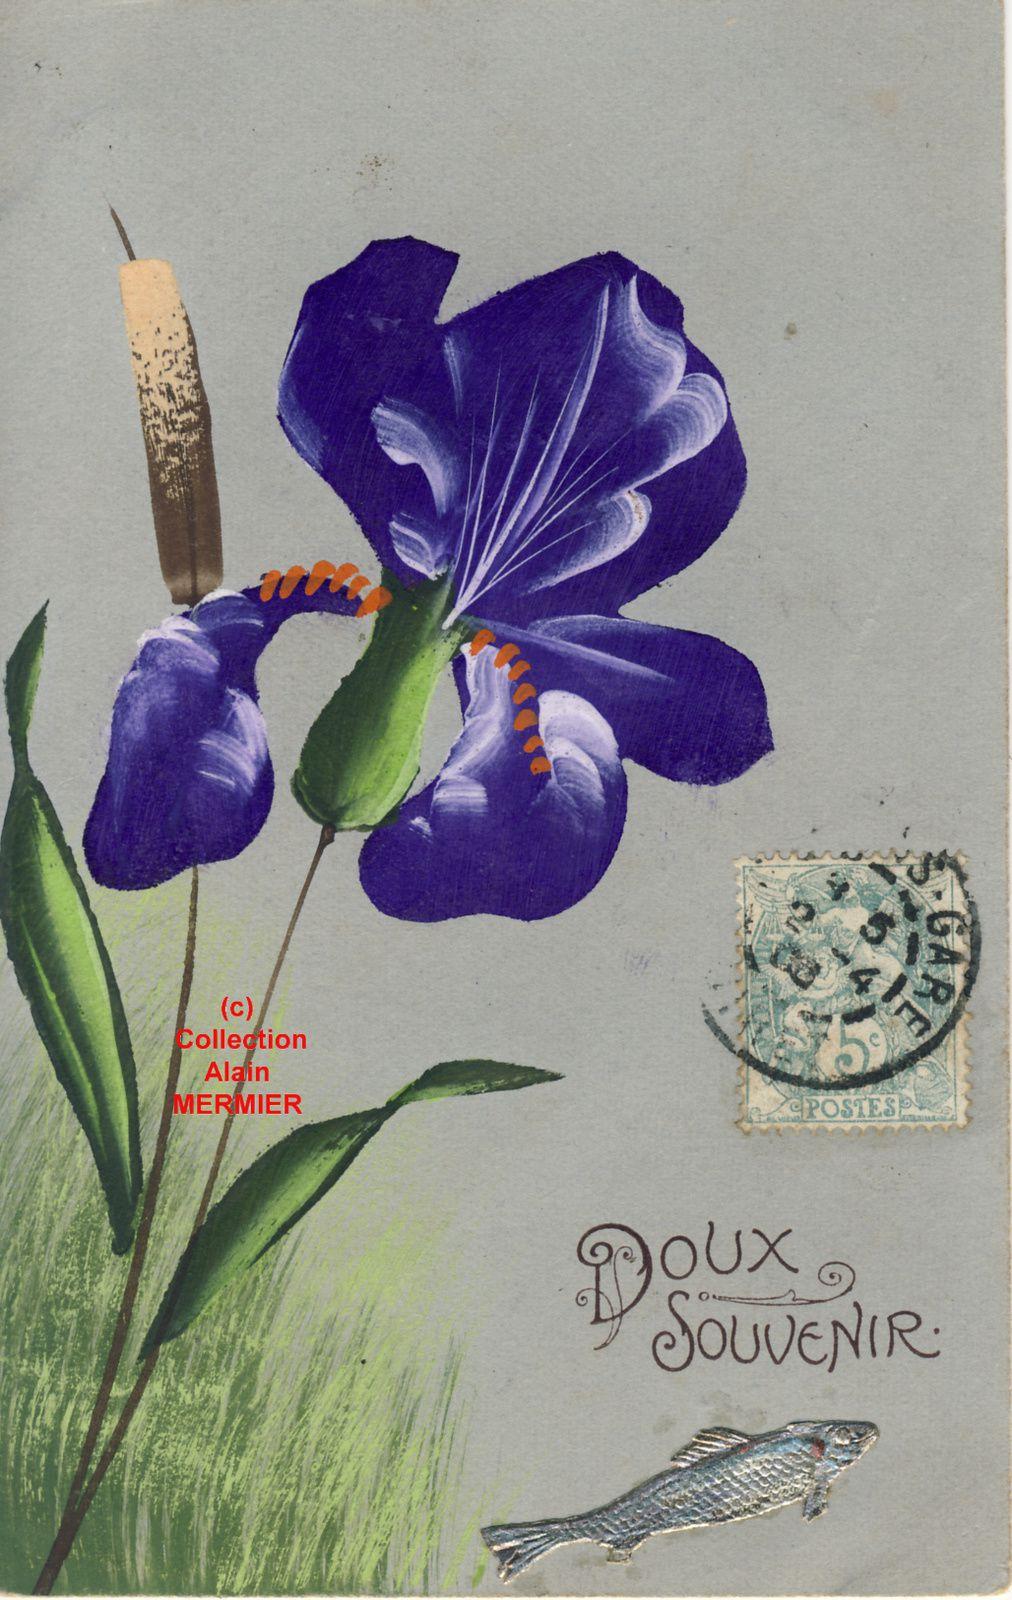 Iris -2021- Peint main. Doux souvenir. 1er avril. France. 1906.